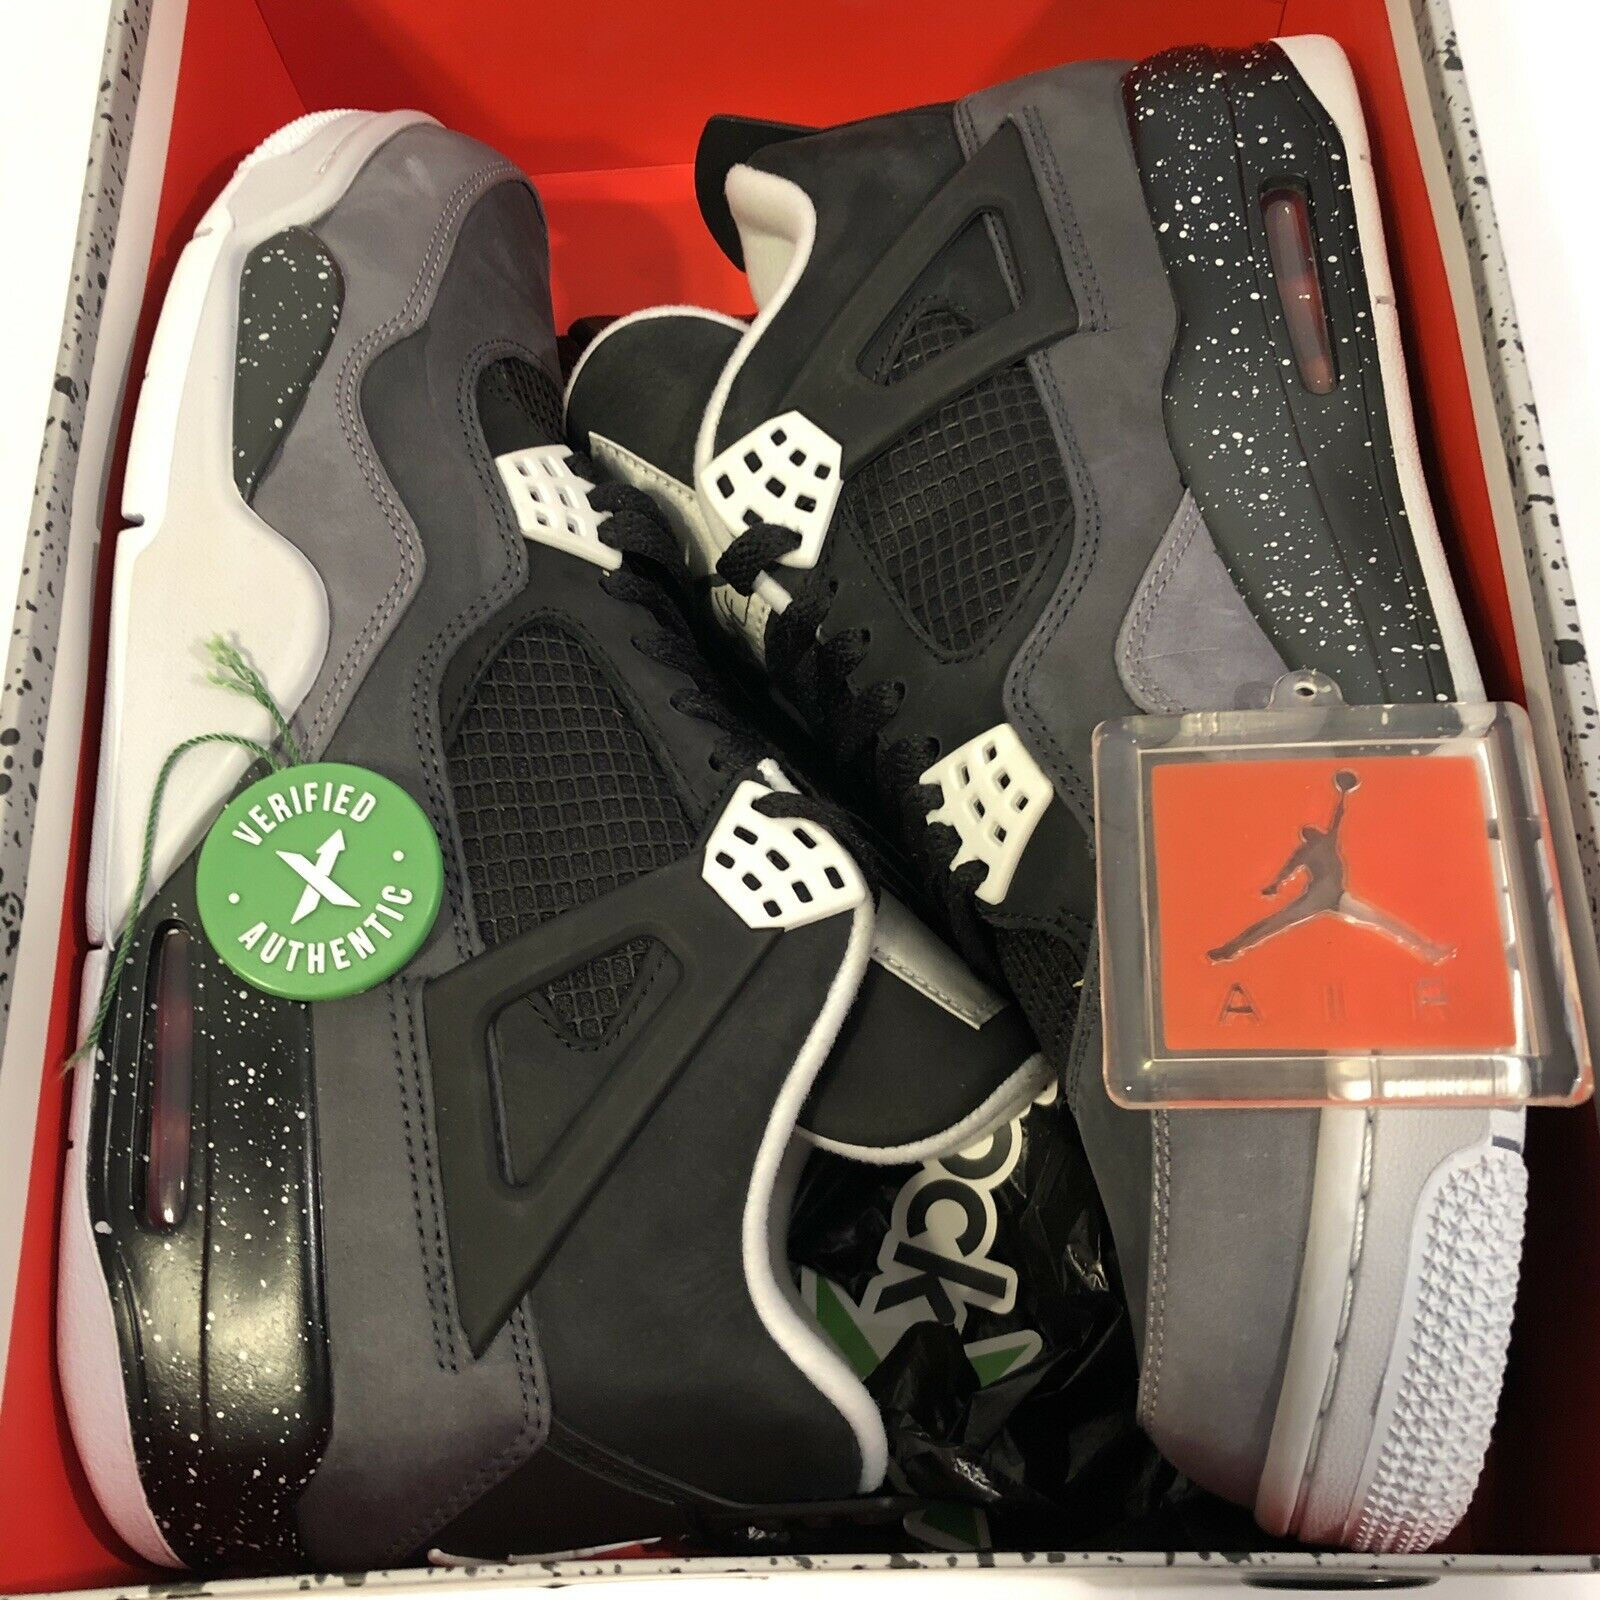 6a028f89 Nike Air Jordan 4 Retro Fear Size 10 (626969-030) for sale online | eBay